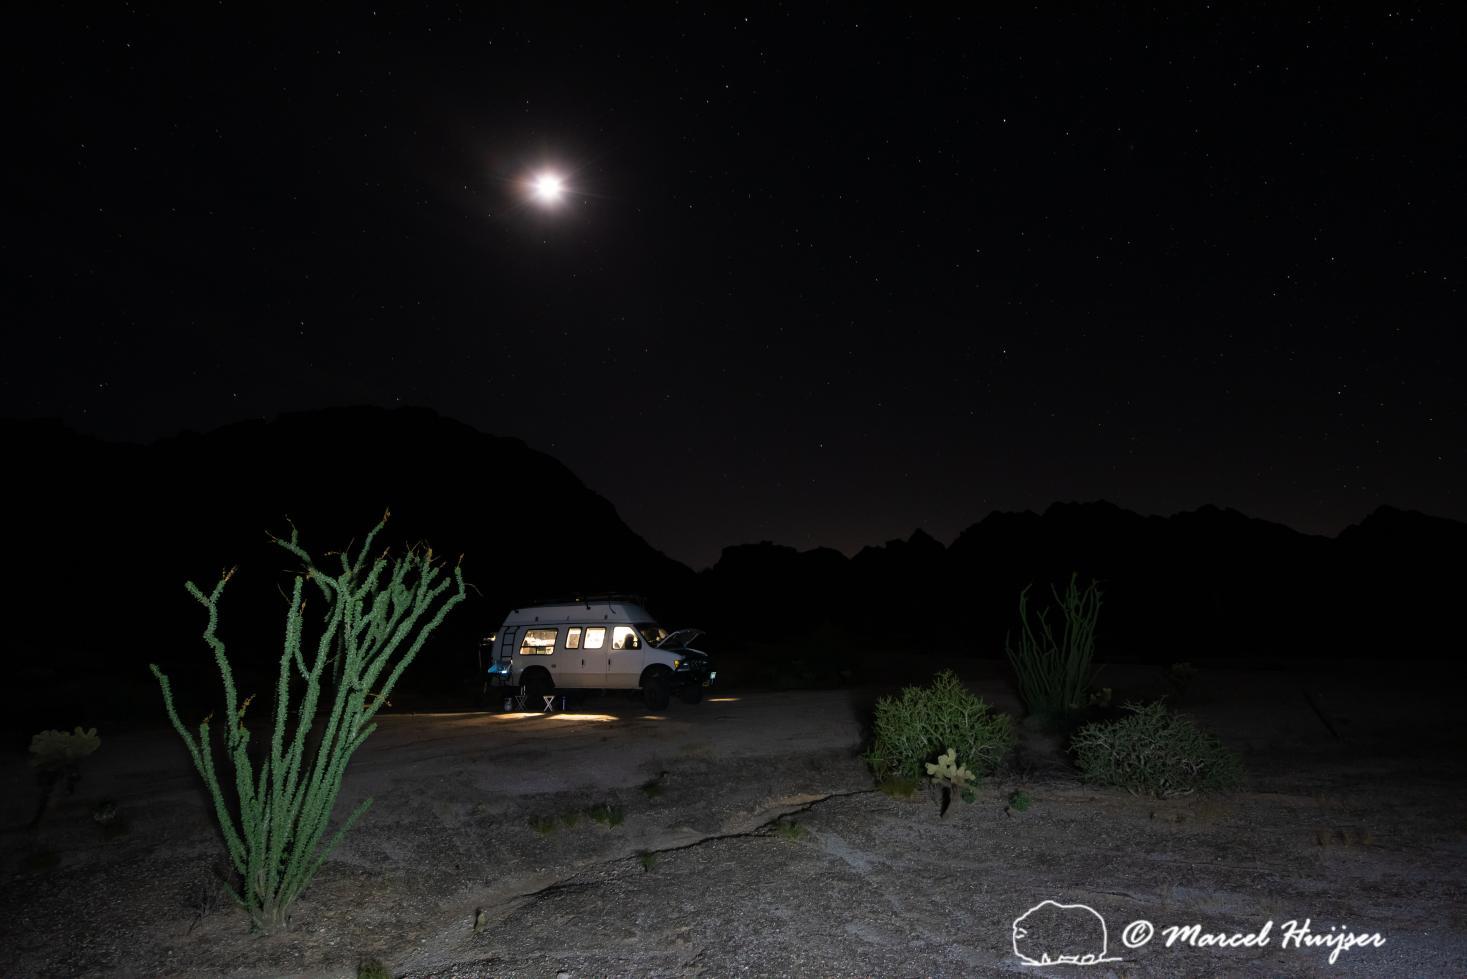 DSC8308 Campsite in the Sonoran desert, Arizona 2